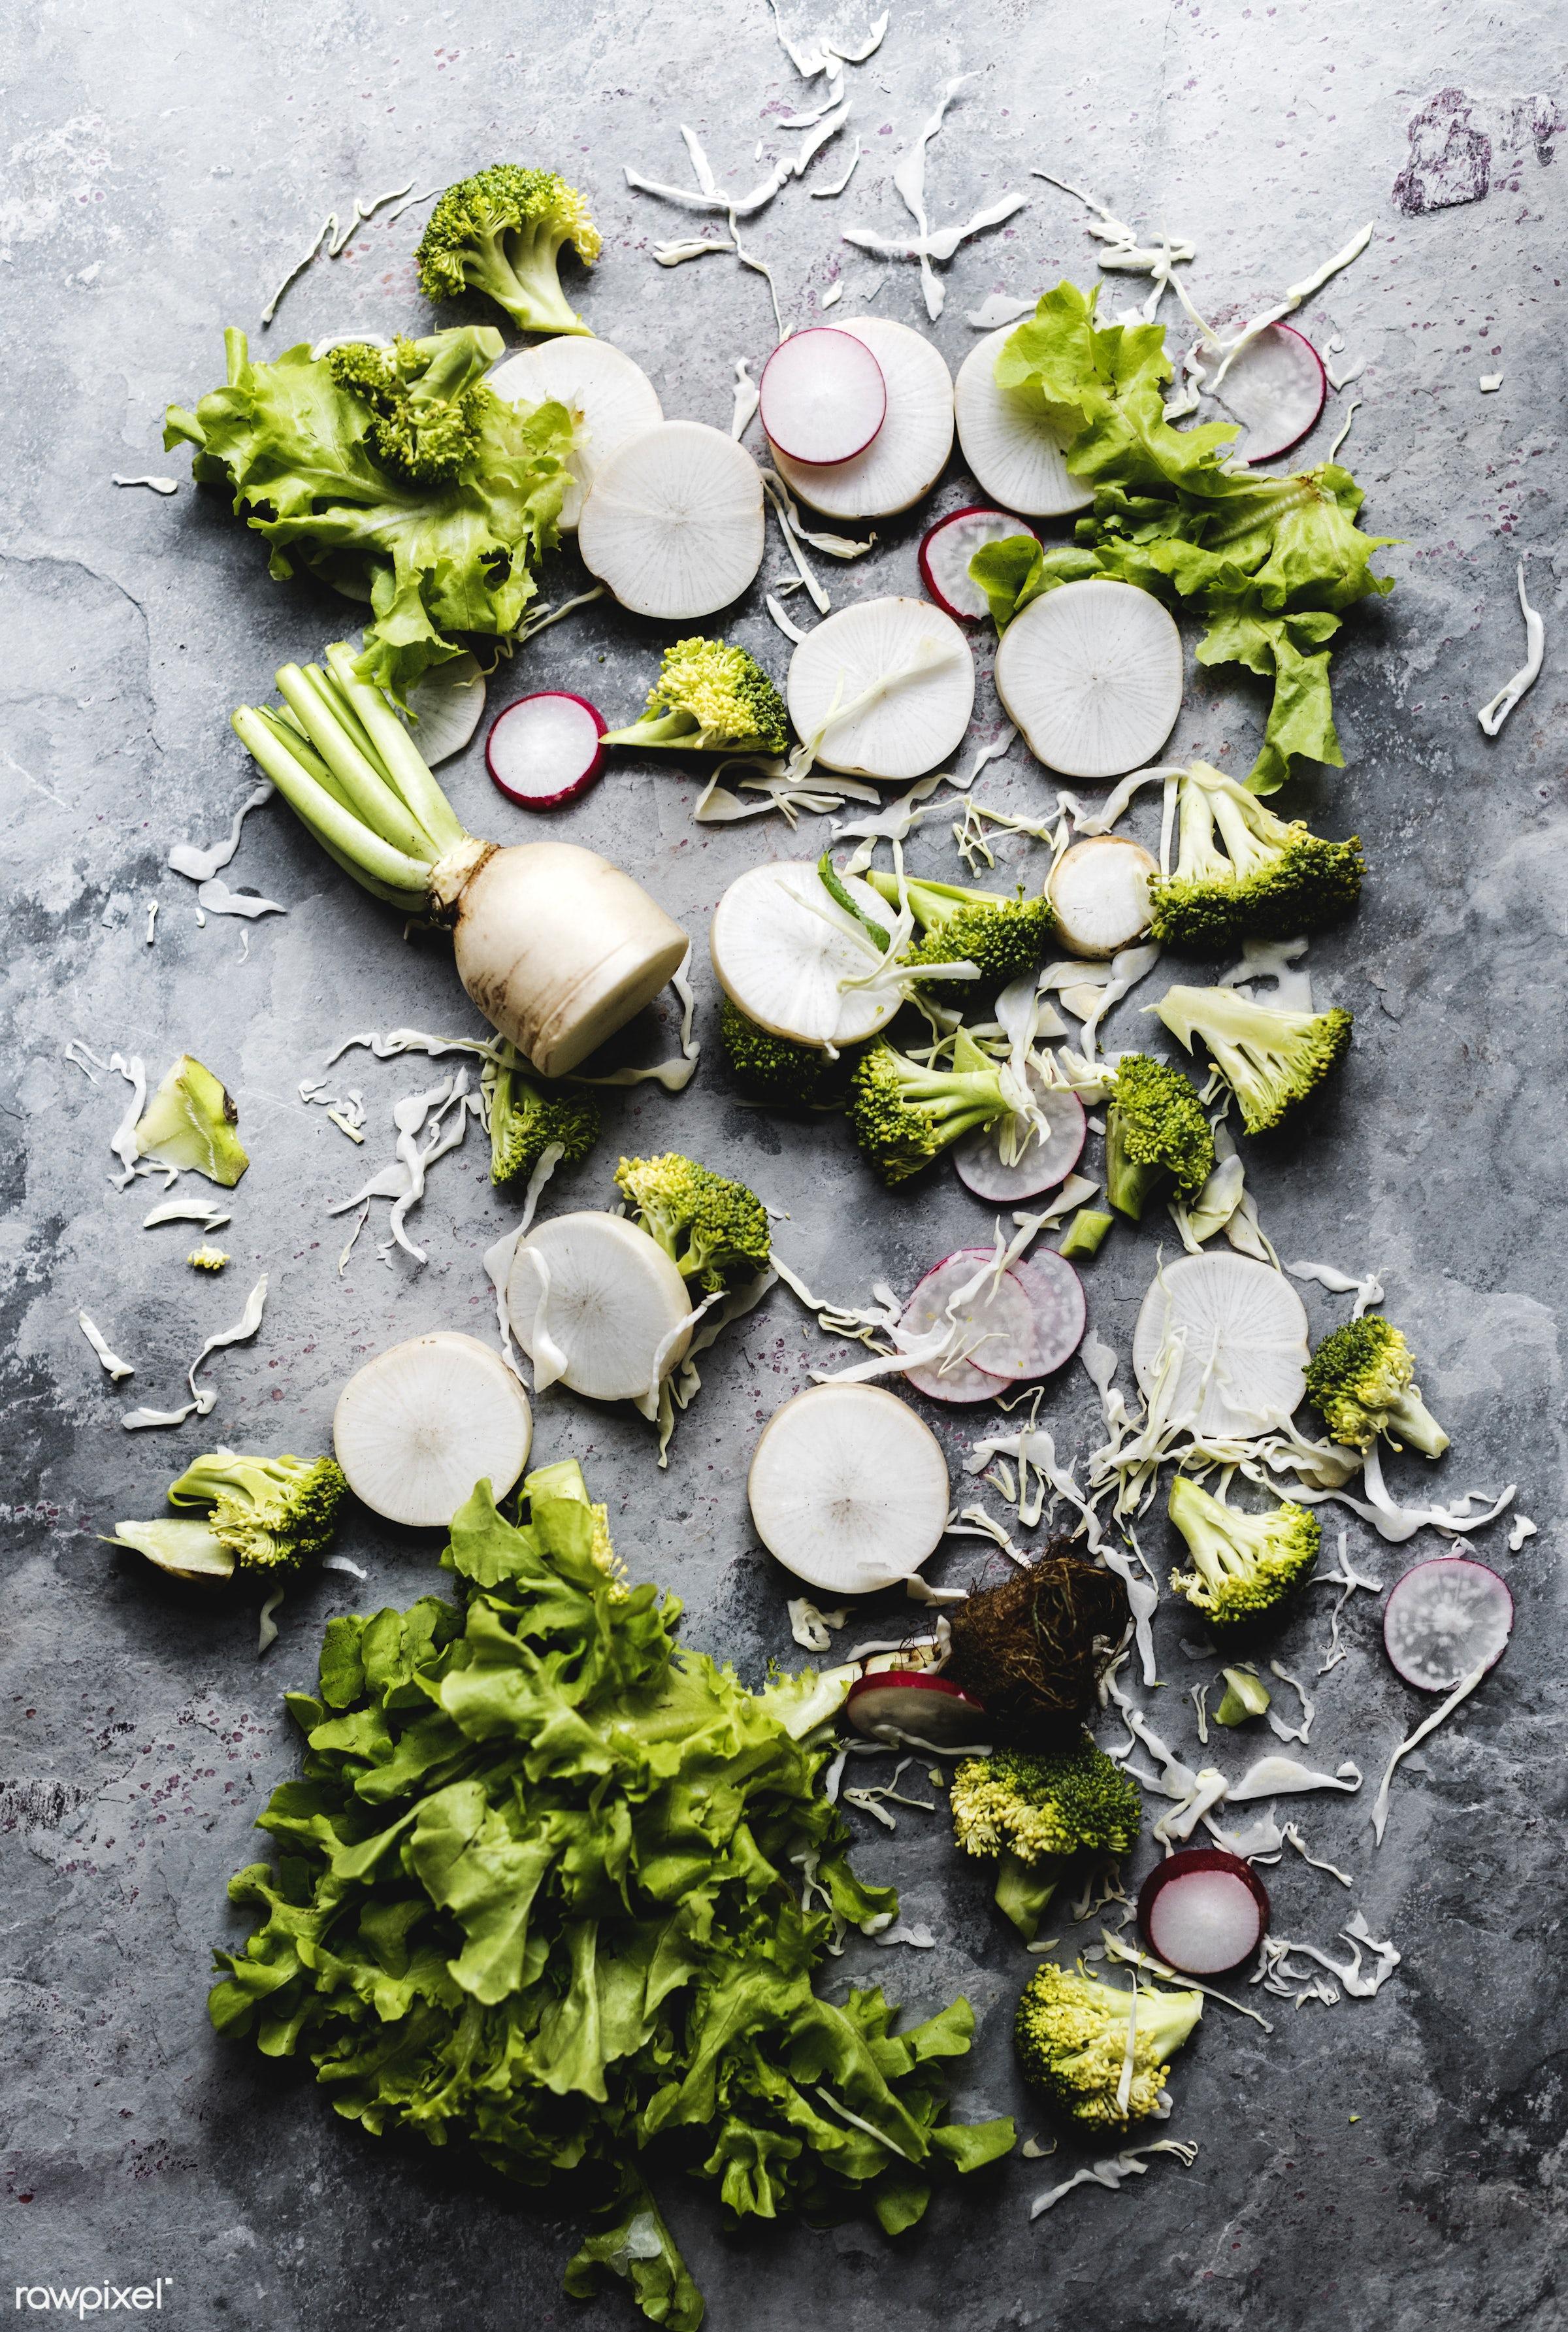 different, raw, variation, gastronomy, type, kind, fresh, vegetarian, cooking, ingredient, gourmet, nourishment, vegetables...